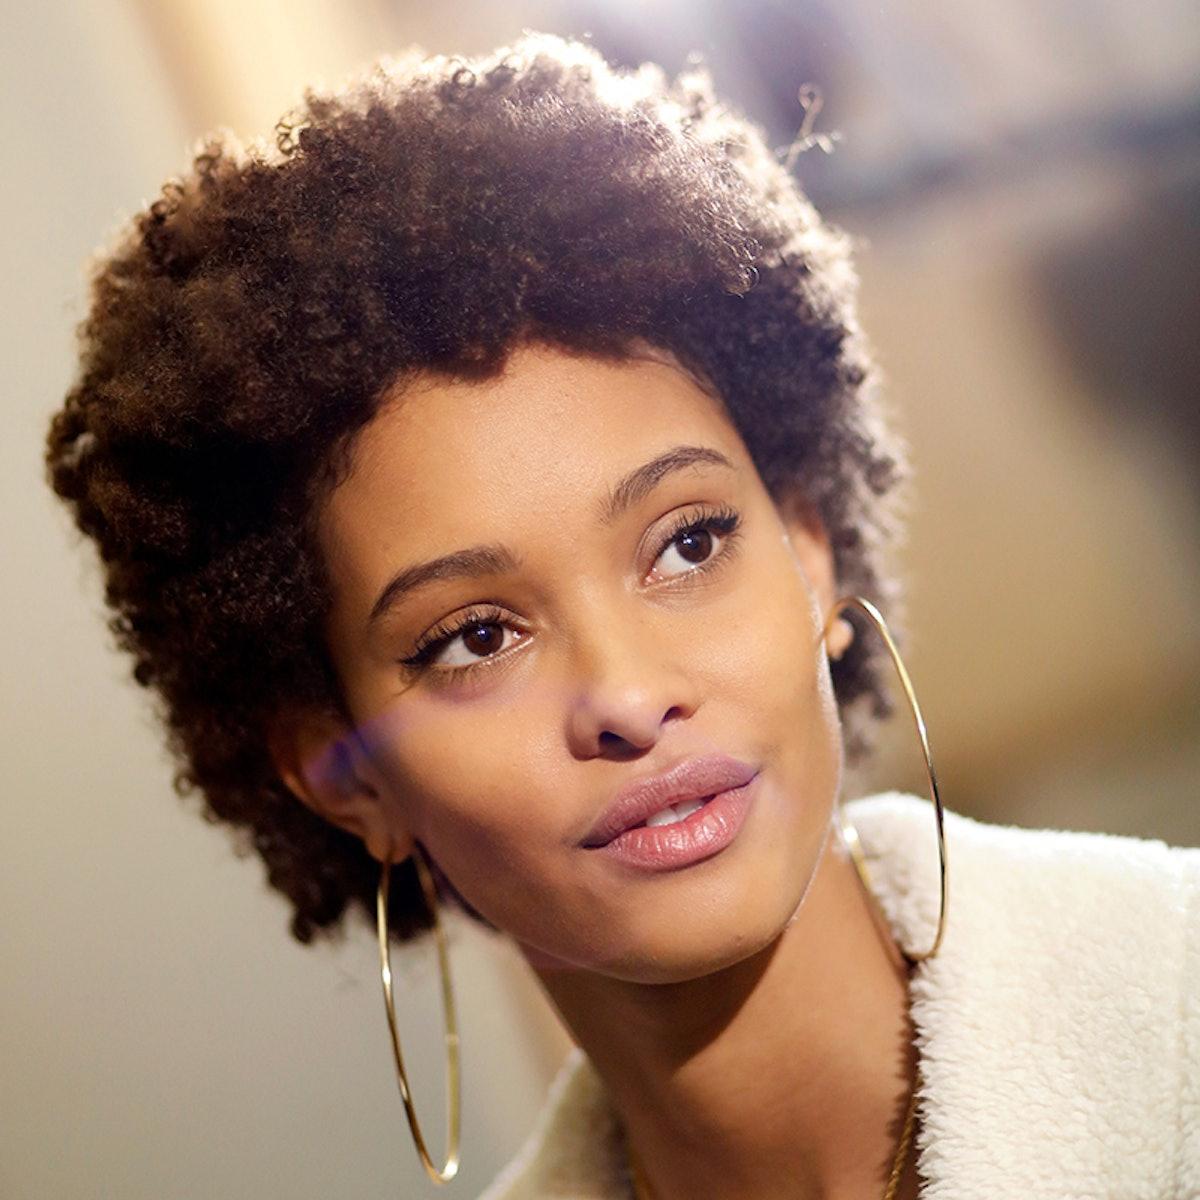 Concealer Hacks To Improve Your Makeup Game